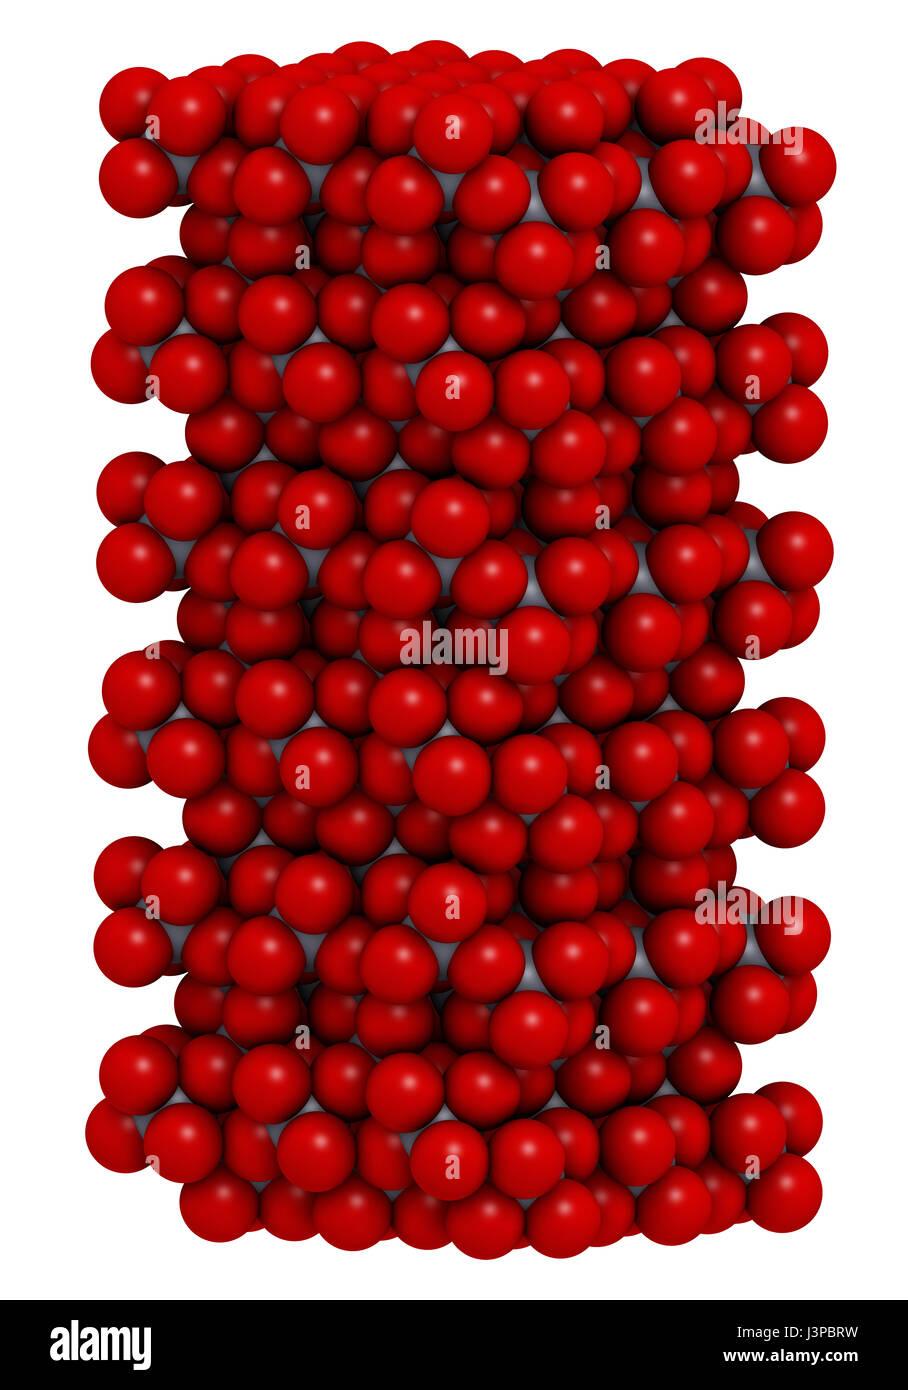 Corundum  Aluminium Oxide   Crystal Structure  Ruby Gems